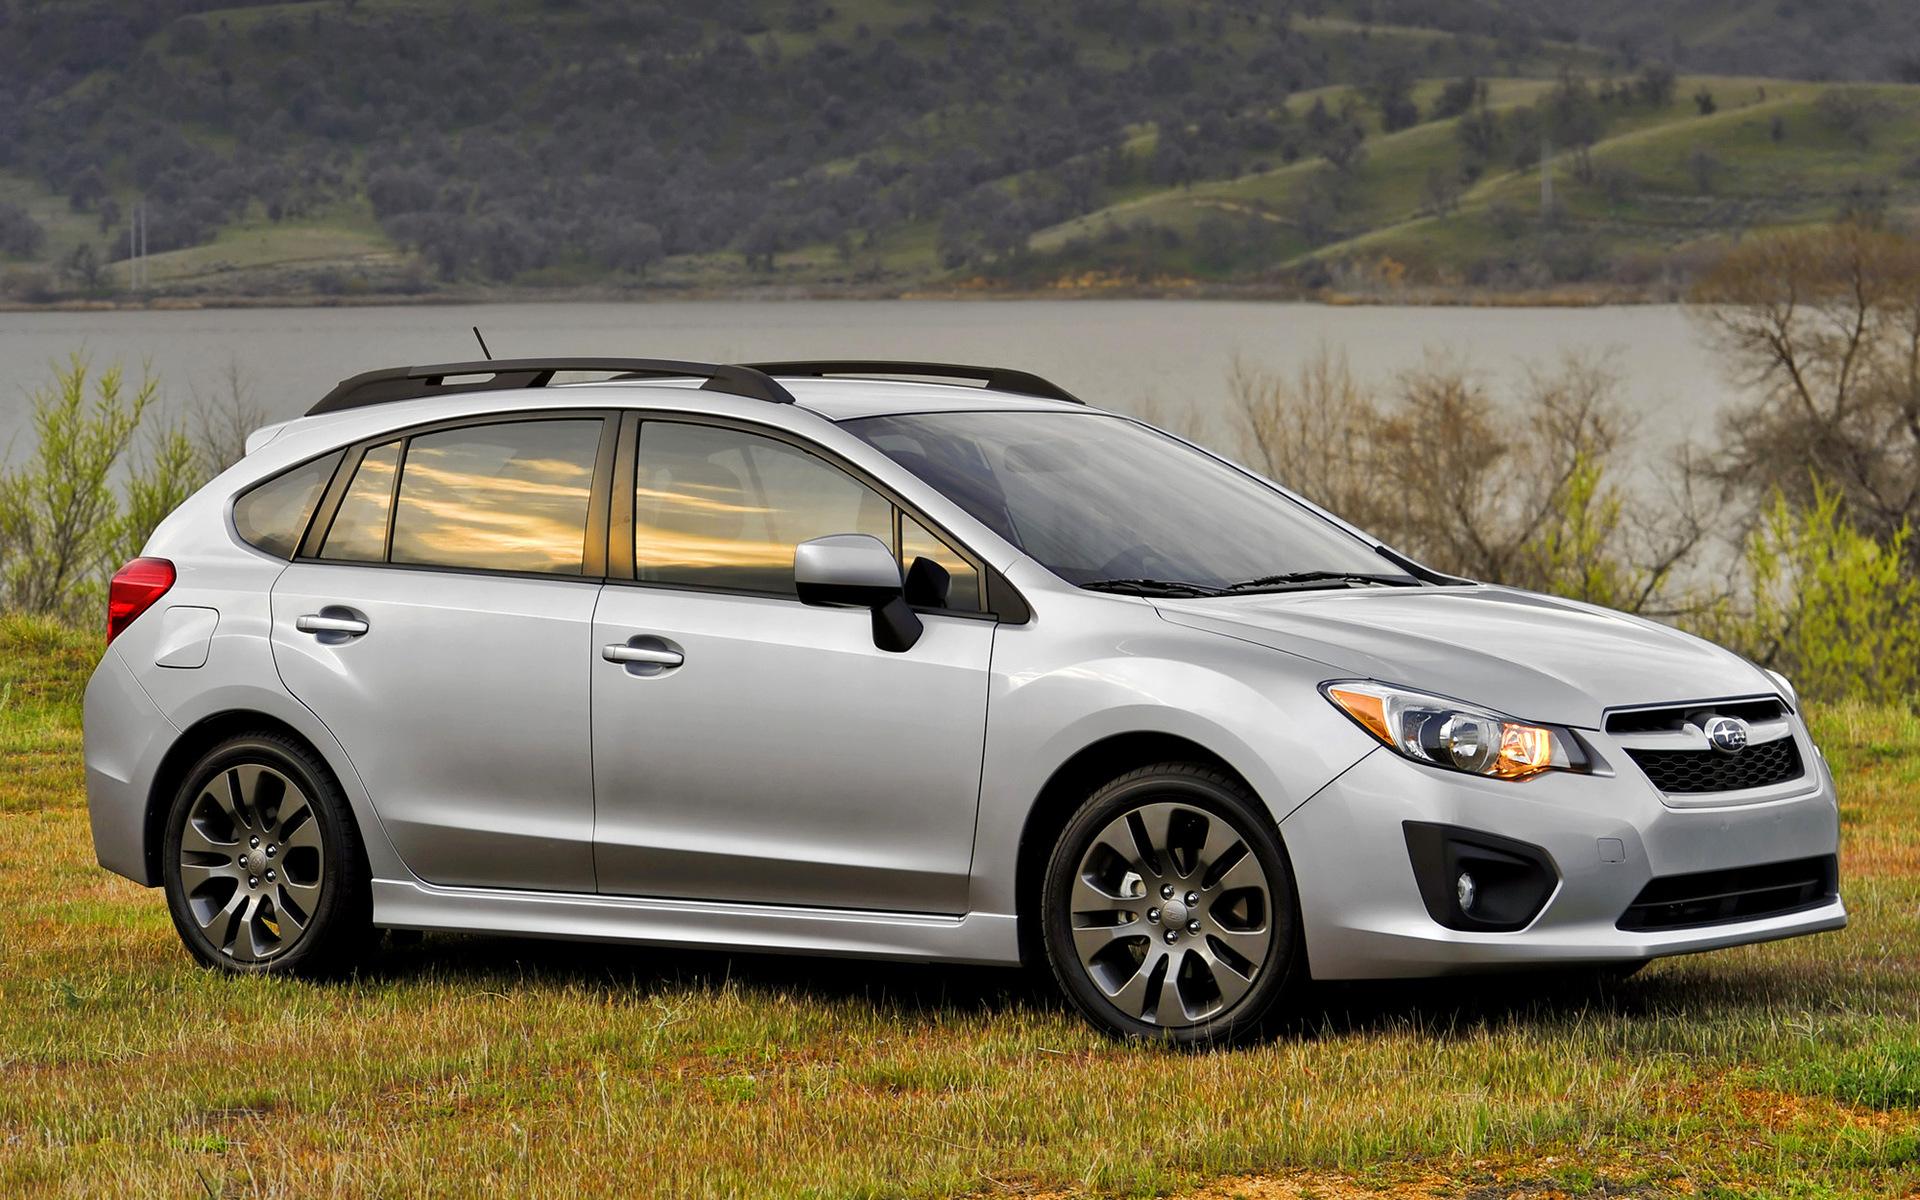 2011 Subaru Impreza Sport Hatchback (US)